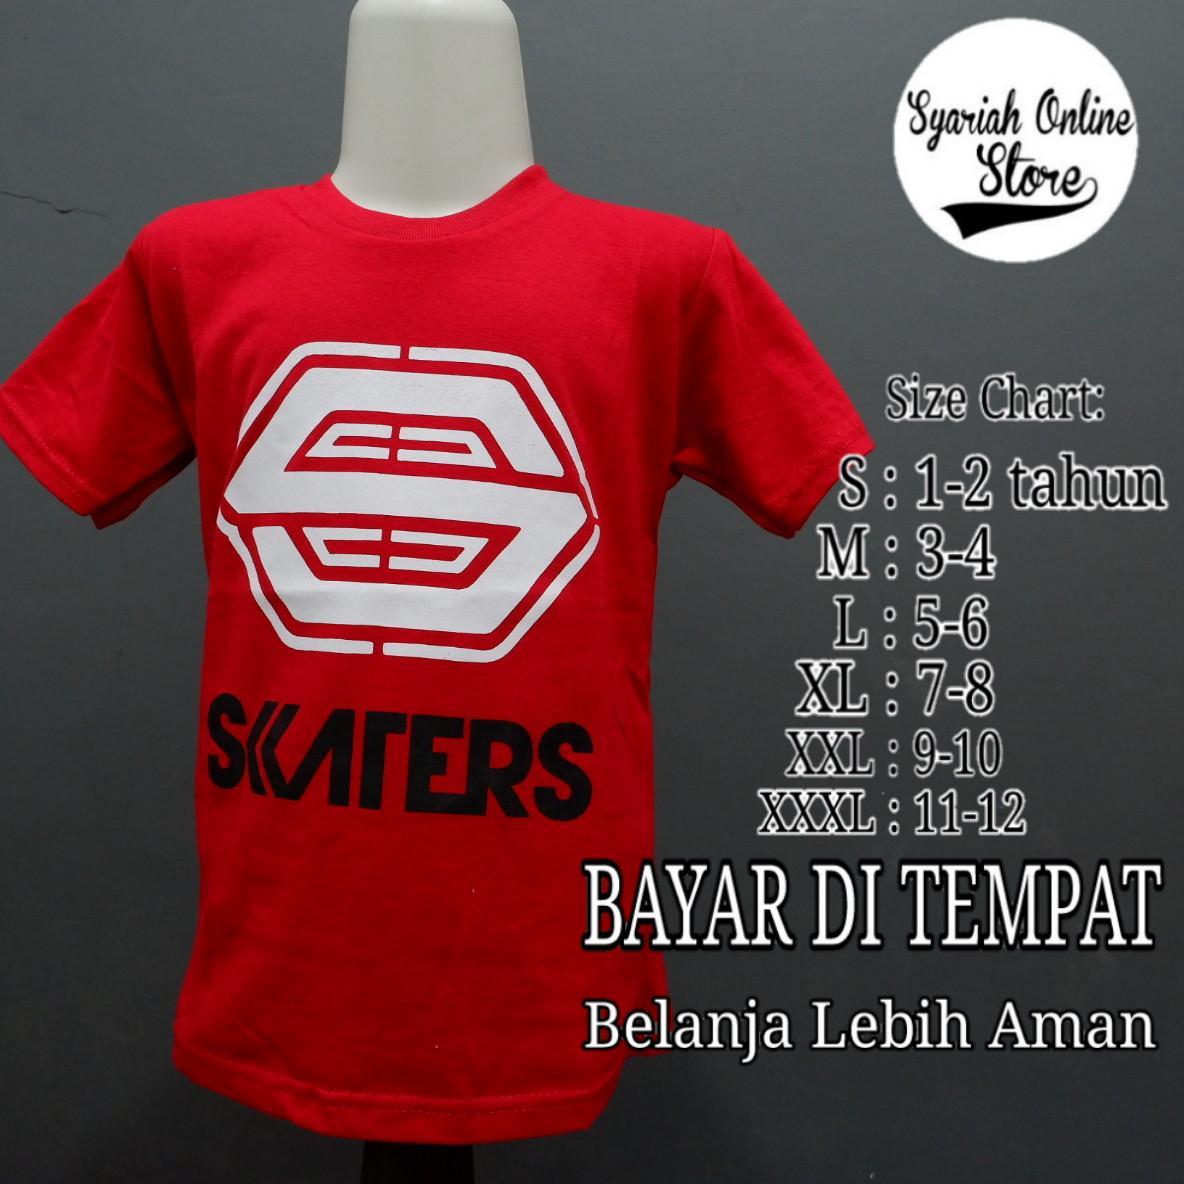 Kaos/baju Anak Motif Distro Skater By Syariah Online Store.